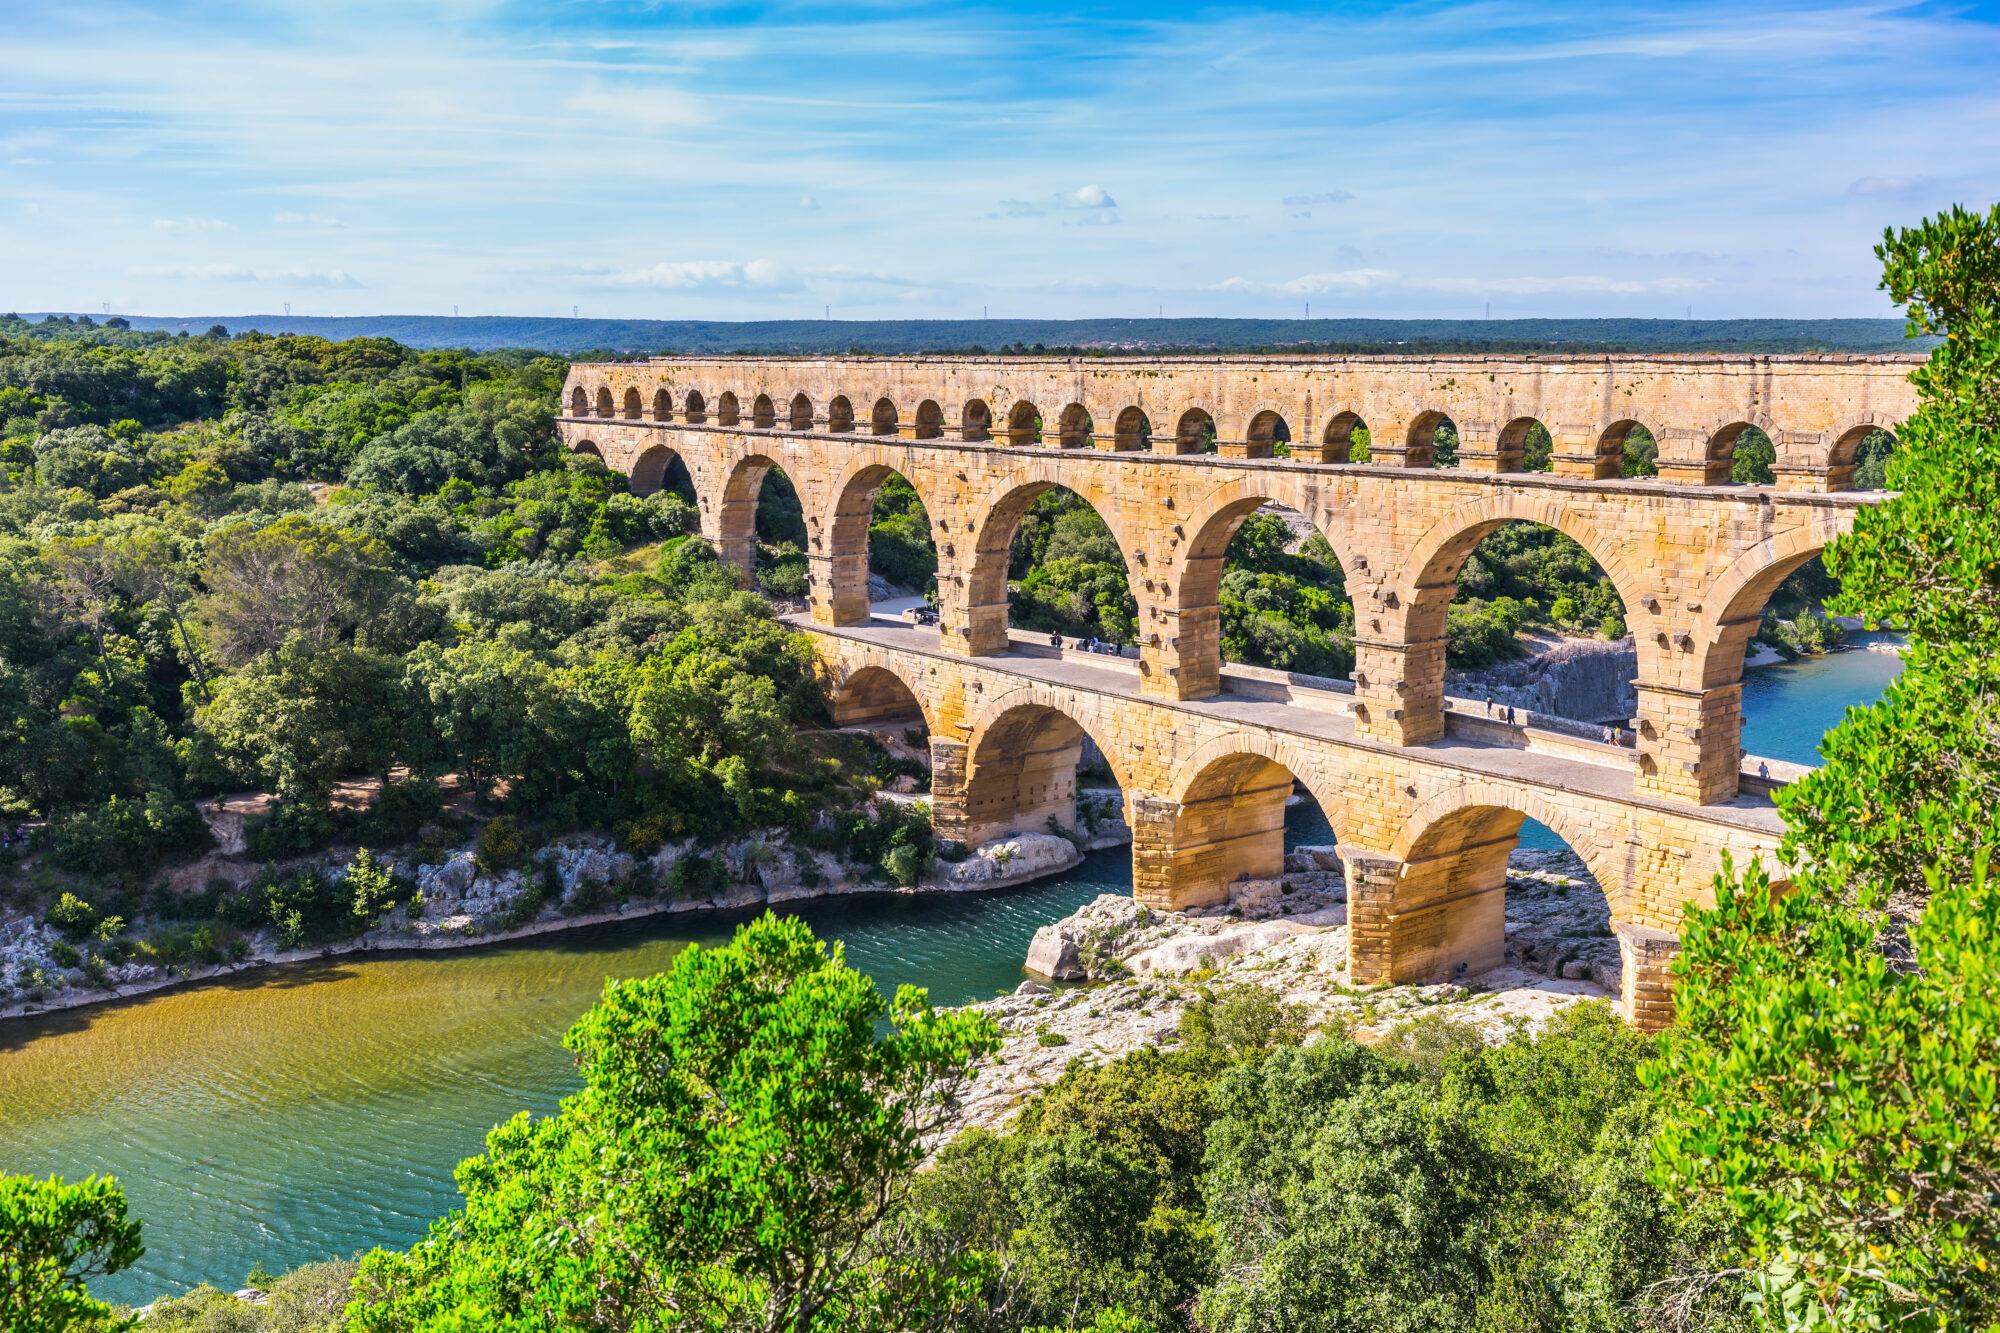 Three-tiered aqueduct Pont du Gard and naturalpark